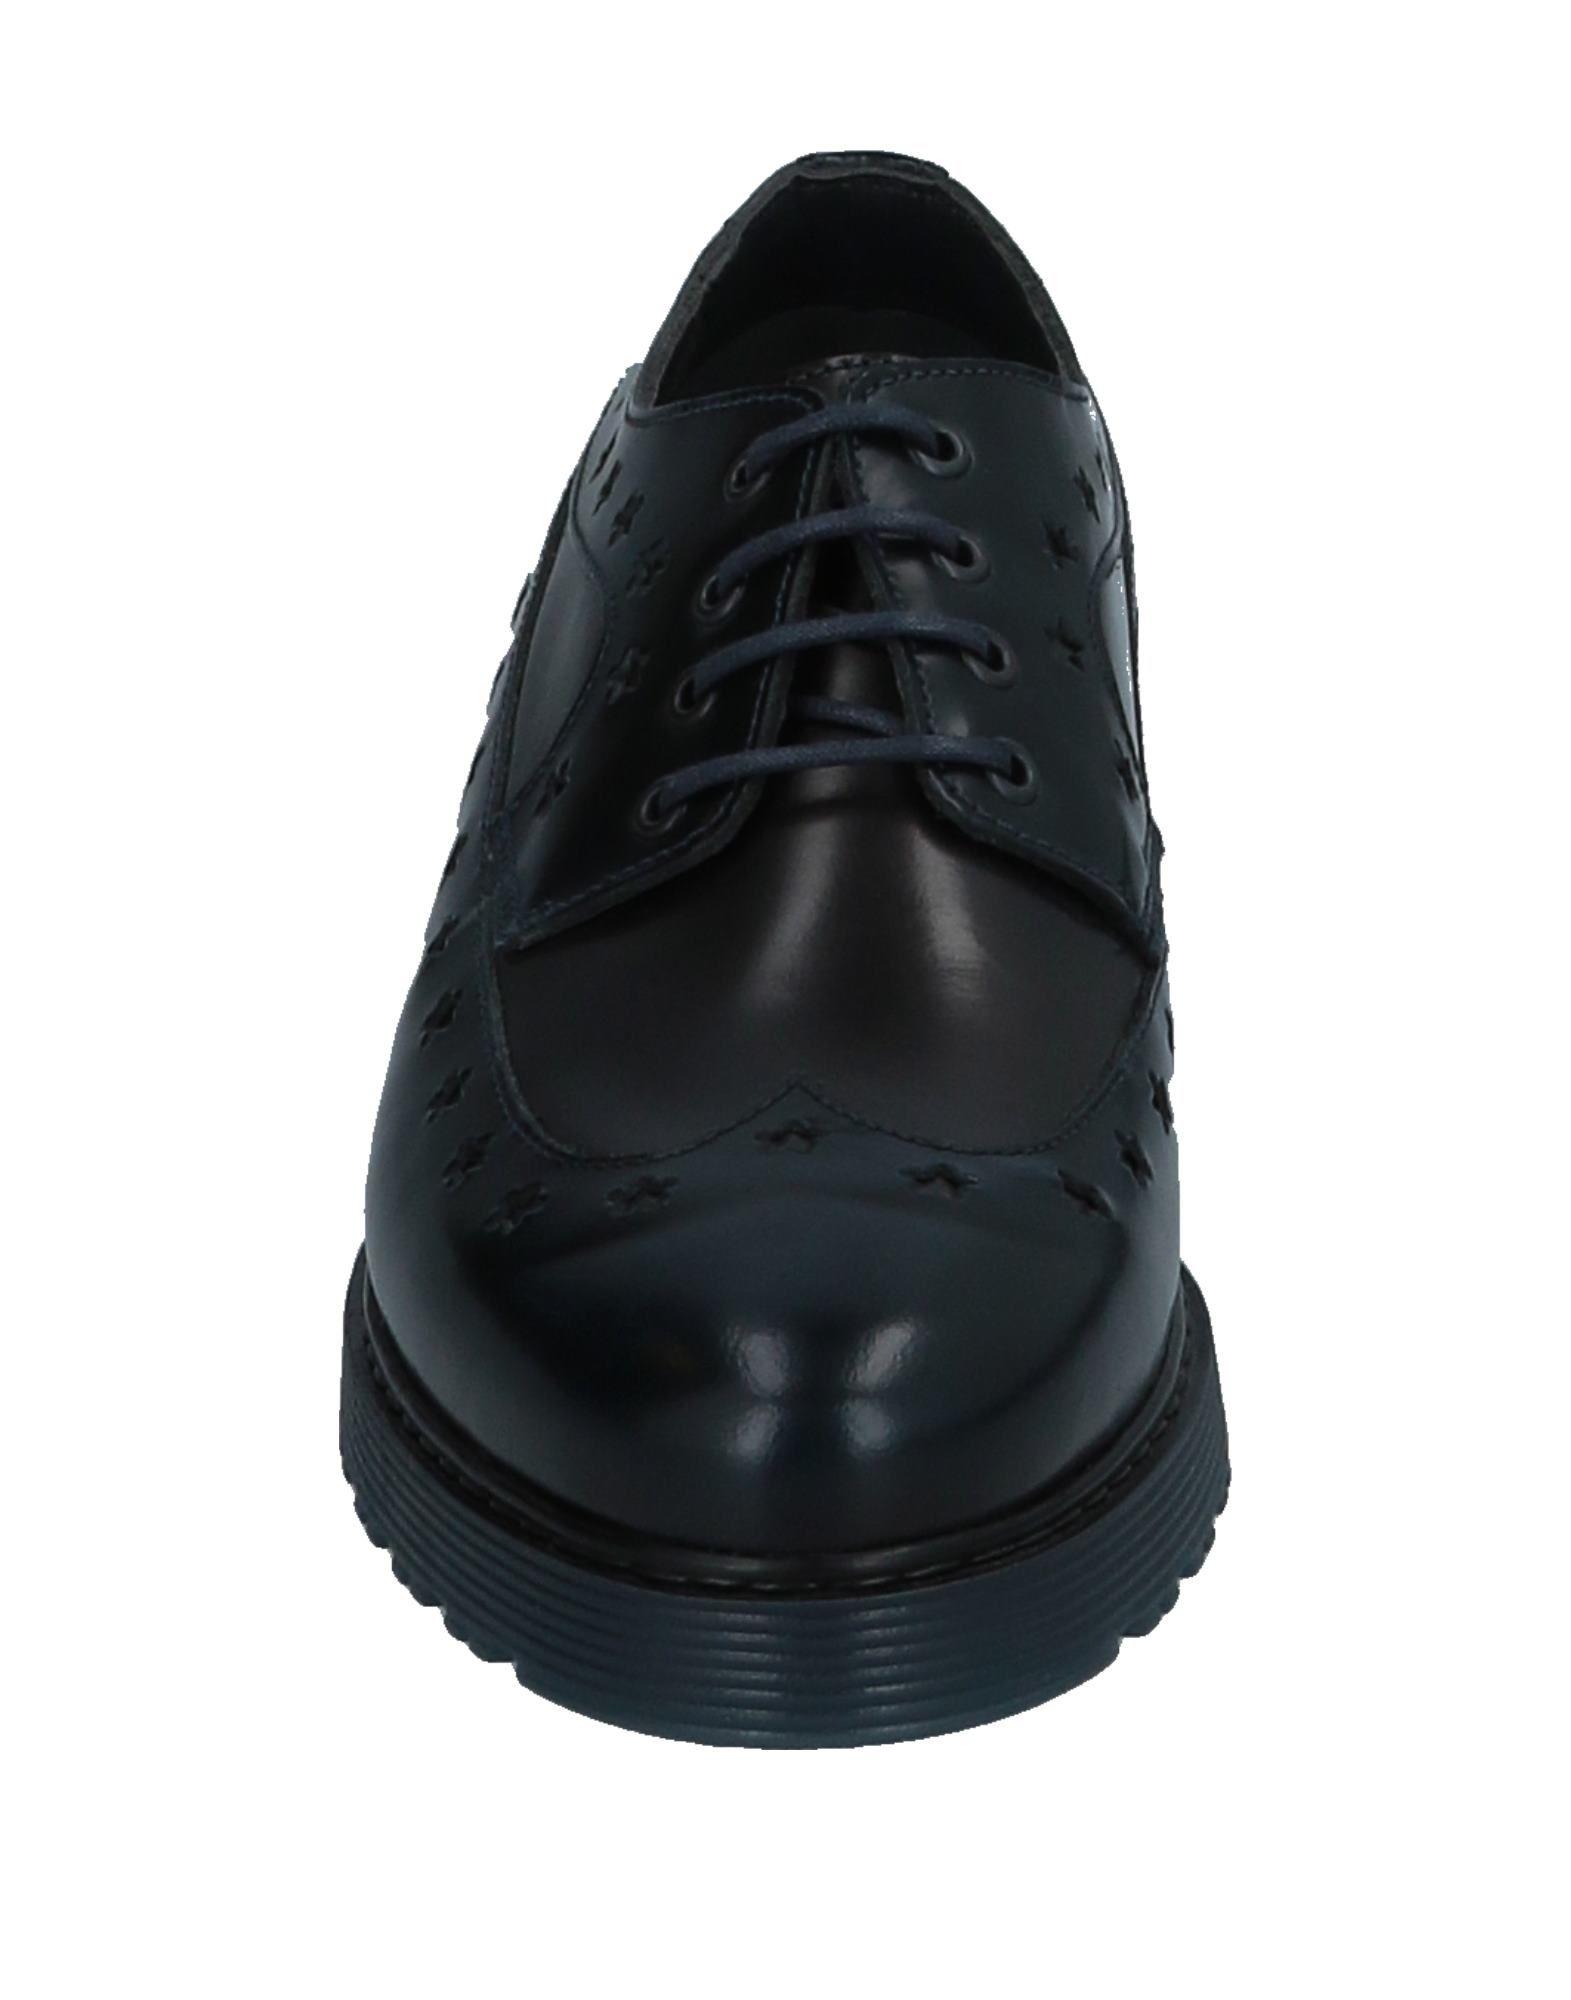 Tommy Hilfiger Schnürschuhe Damen  Schuhe 11522573BX Gute Qualität beliebte Schuhe  cf3fa0